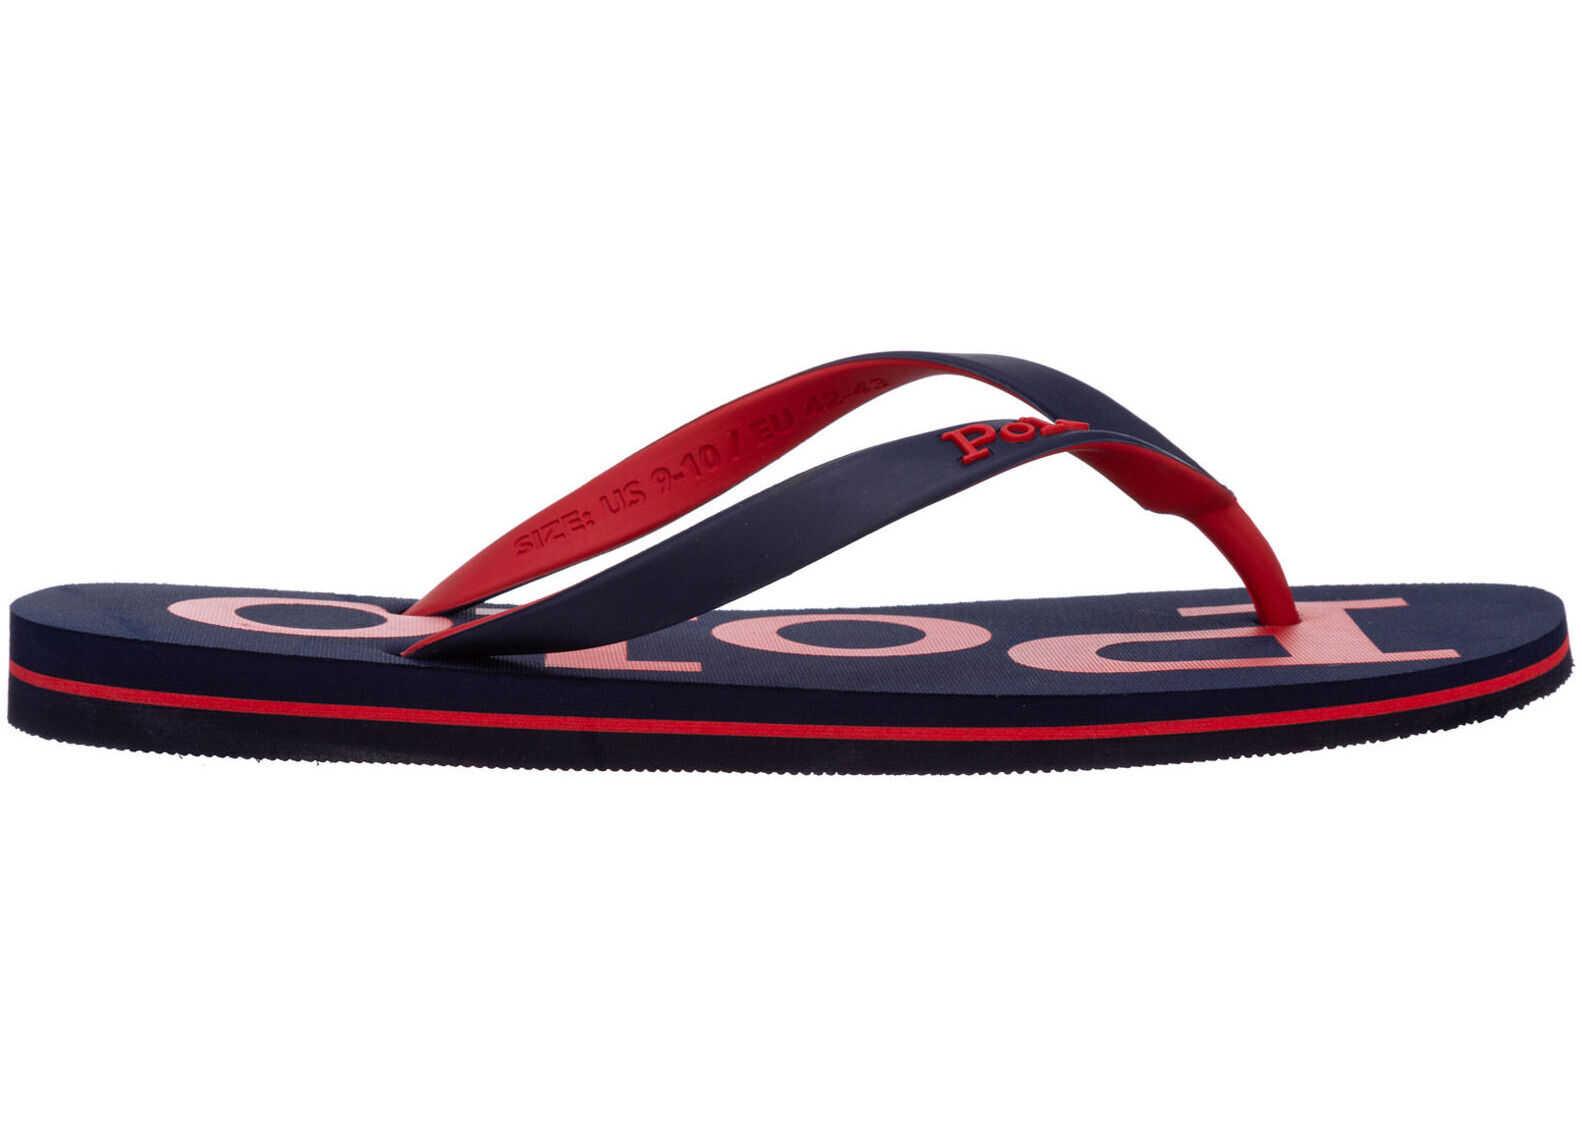 Ralph Lauren Flops Sandals* Blue